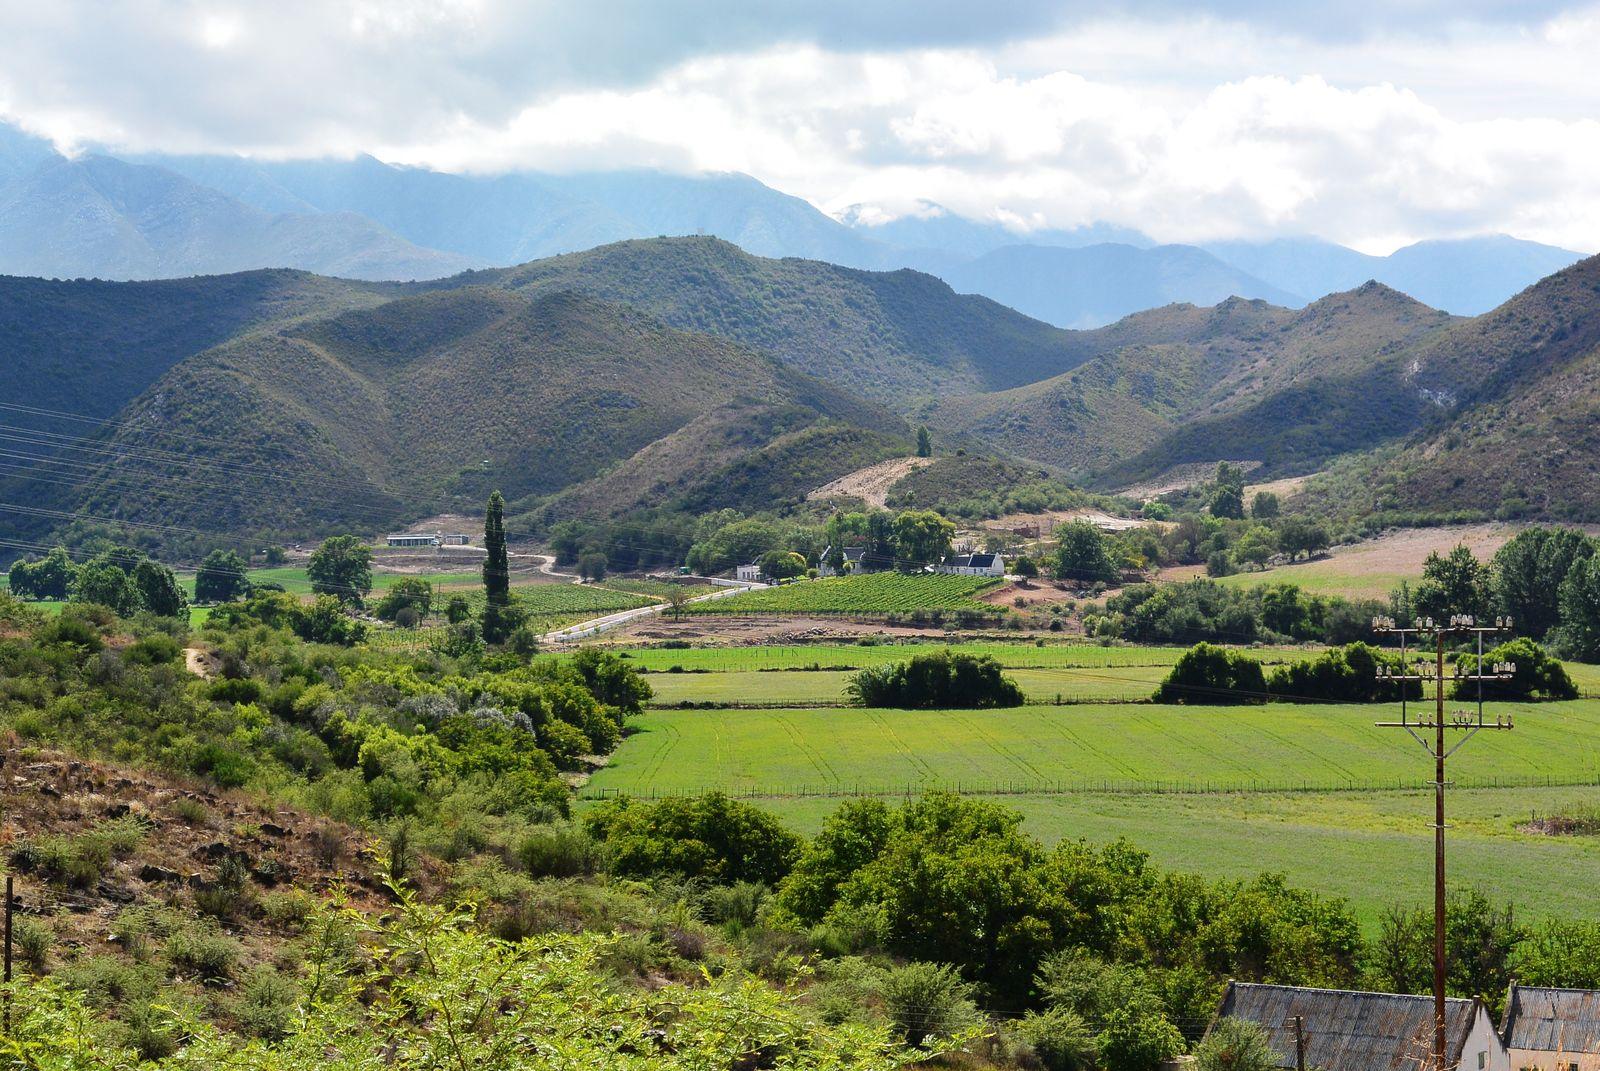 Selfdrive autorondreizen in Zuid-Afrika populair | AmbianceTravel